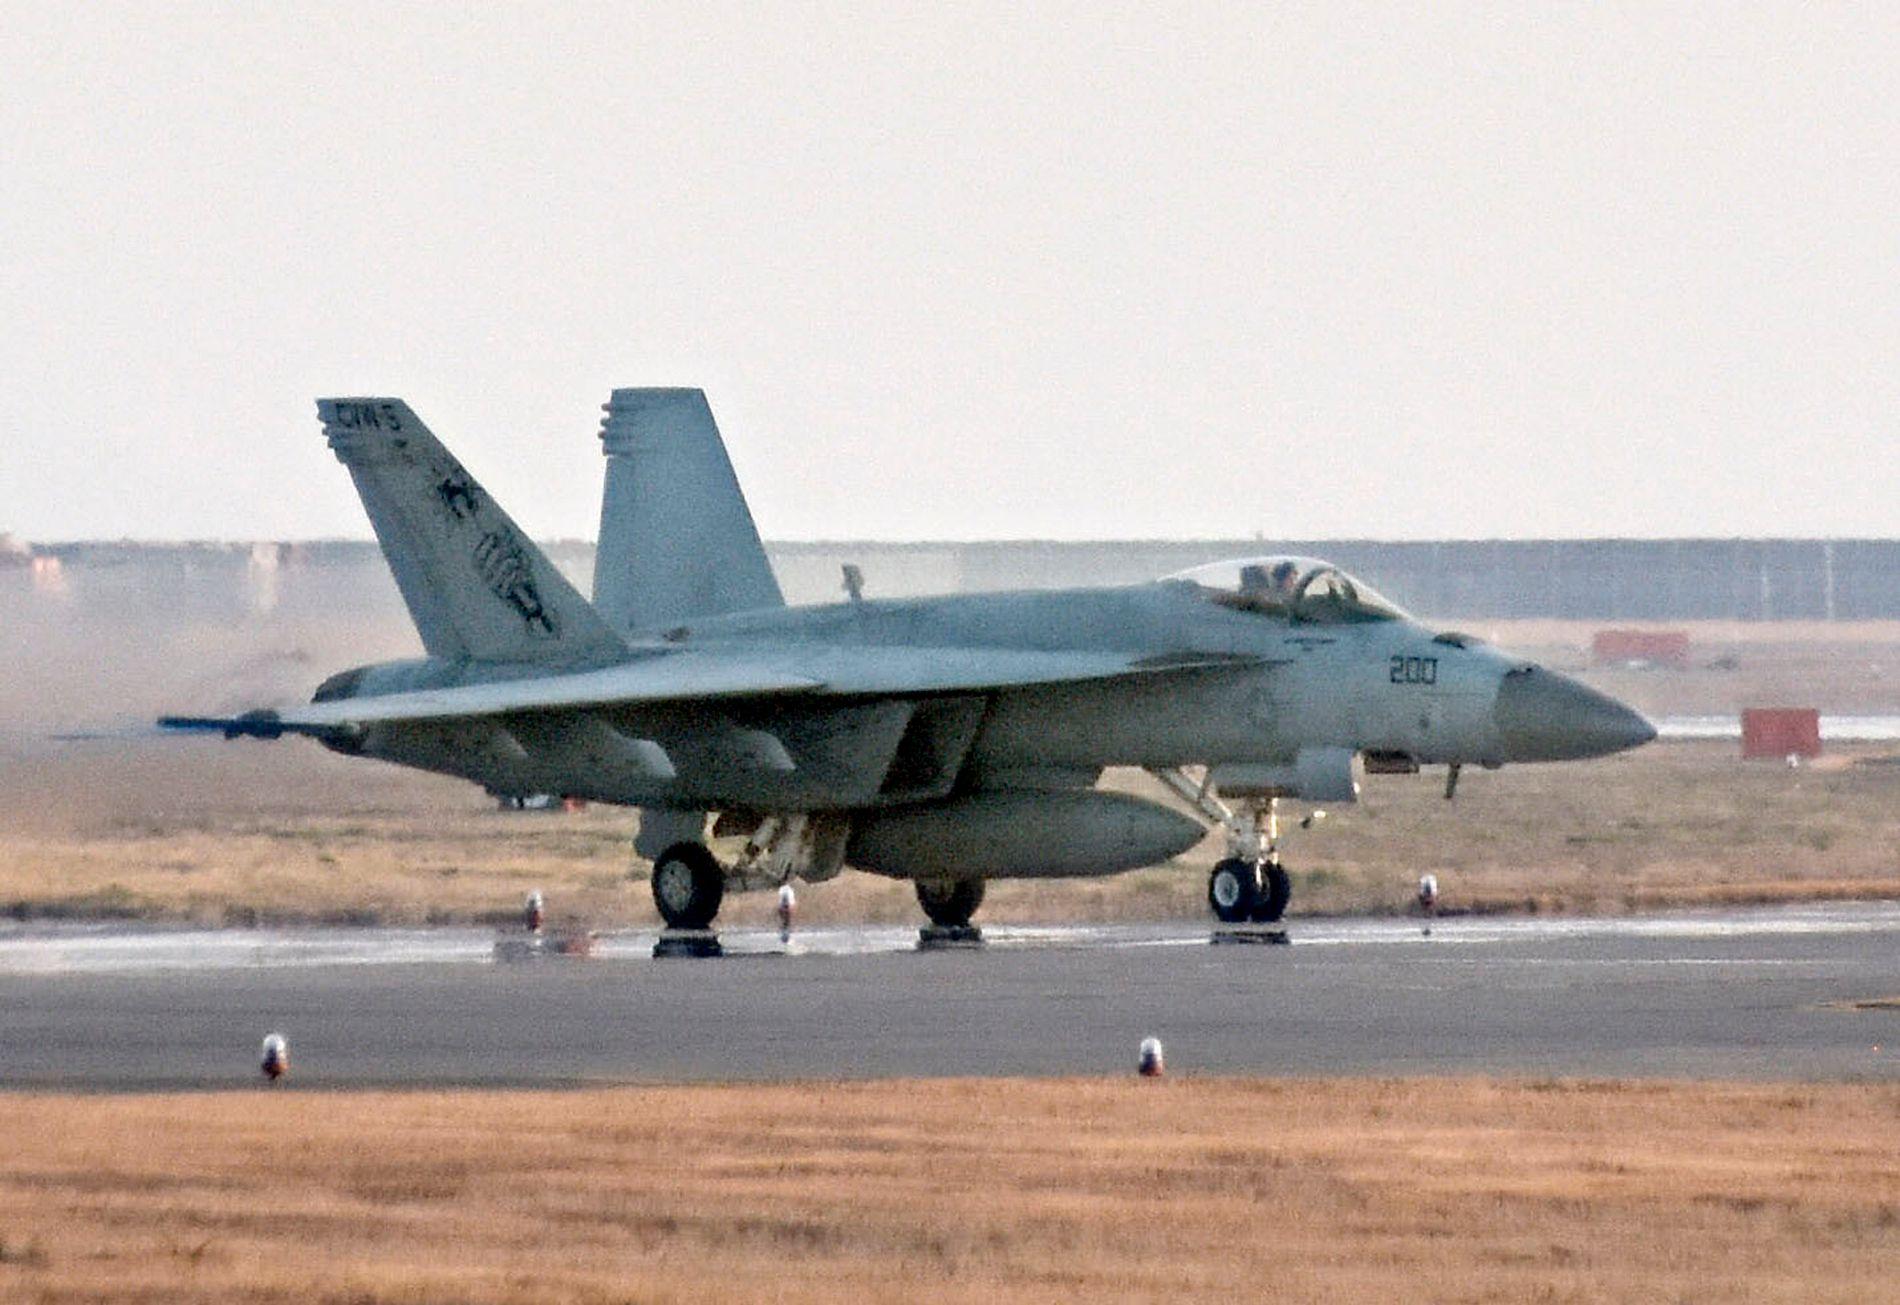 JAPAN: Et F/A-18 jetfly på den amerikanske marinebasen Iwakuni i Japan i mars i år.